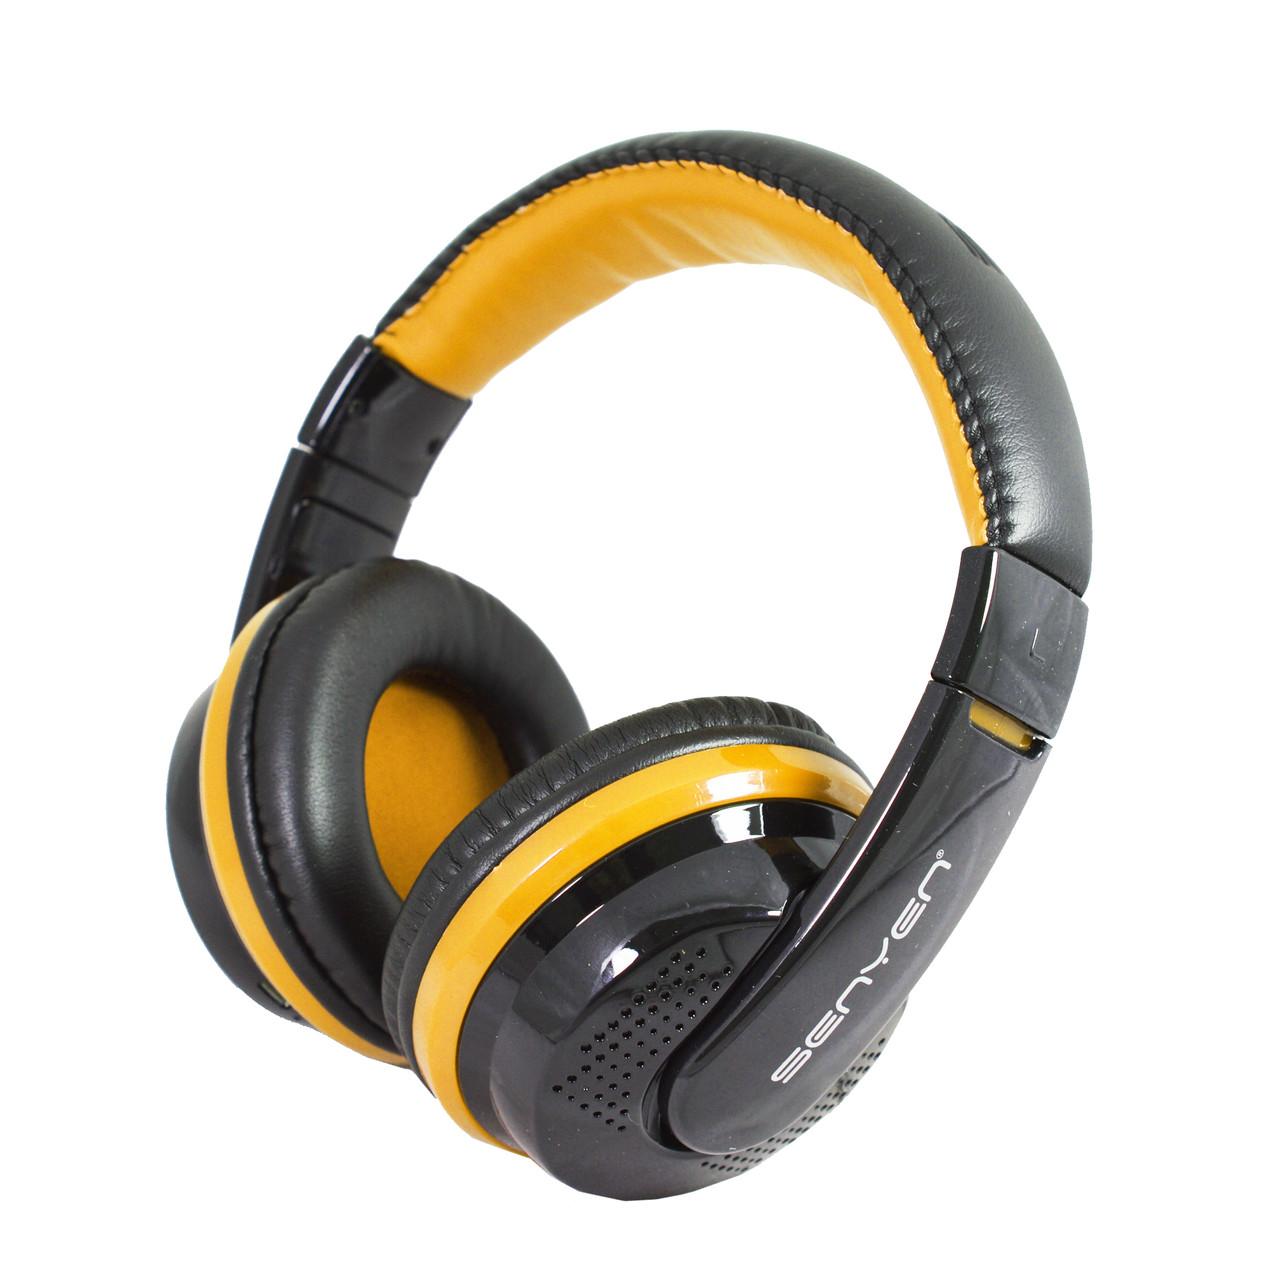 Наушники беспроводные Stereo Senyen SY208 Bluetooth Black-Yellow ... 1a2d25f9344c6